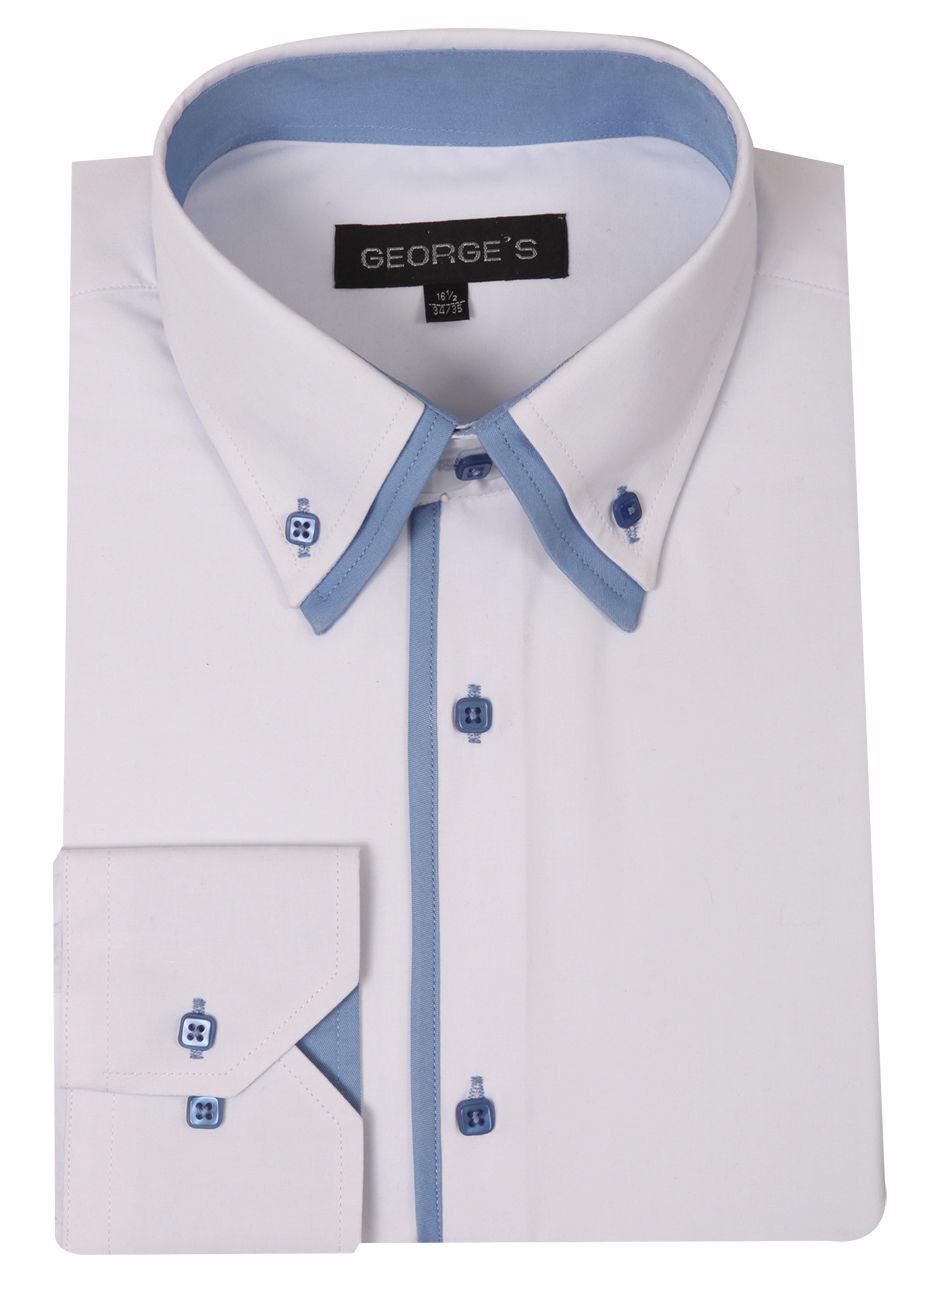 New Mens 39 Dress Shirt Double Collar Two Toned Italian